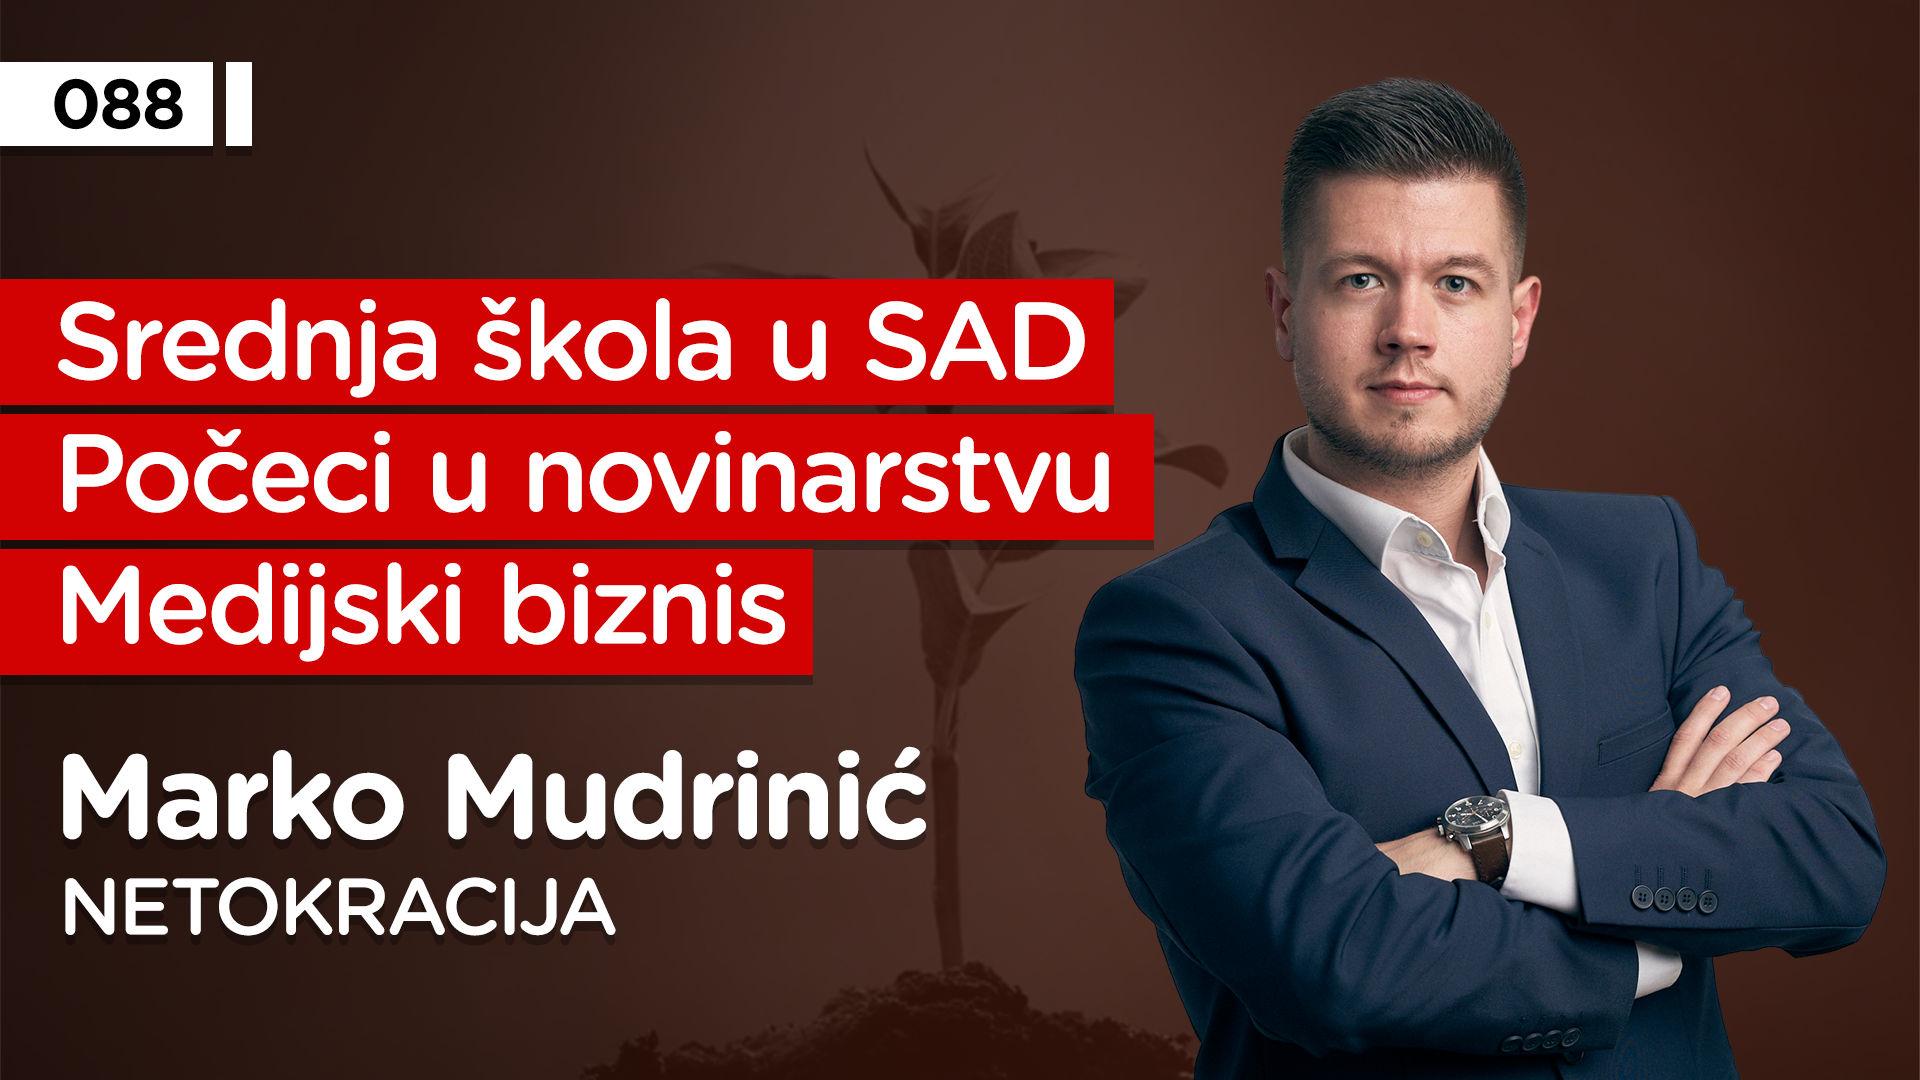 EP088: Marko Mudrinić